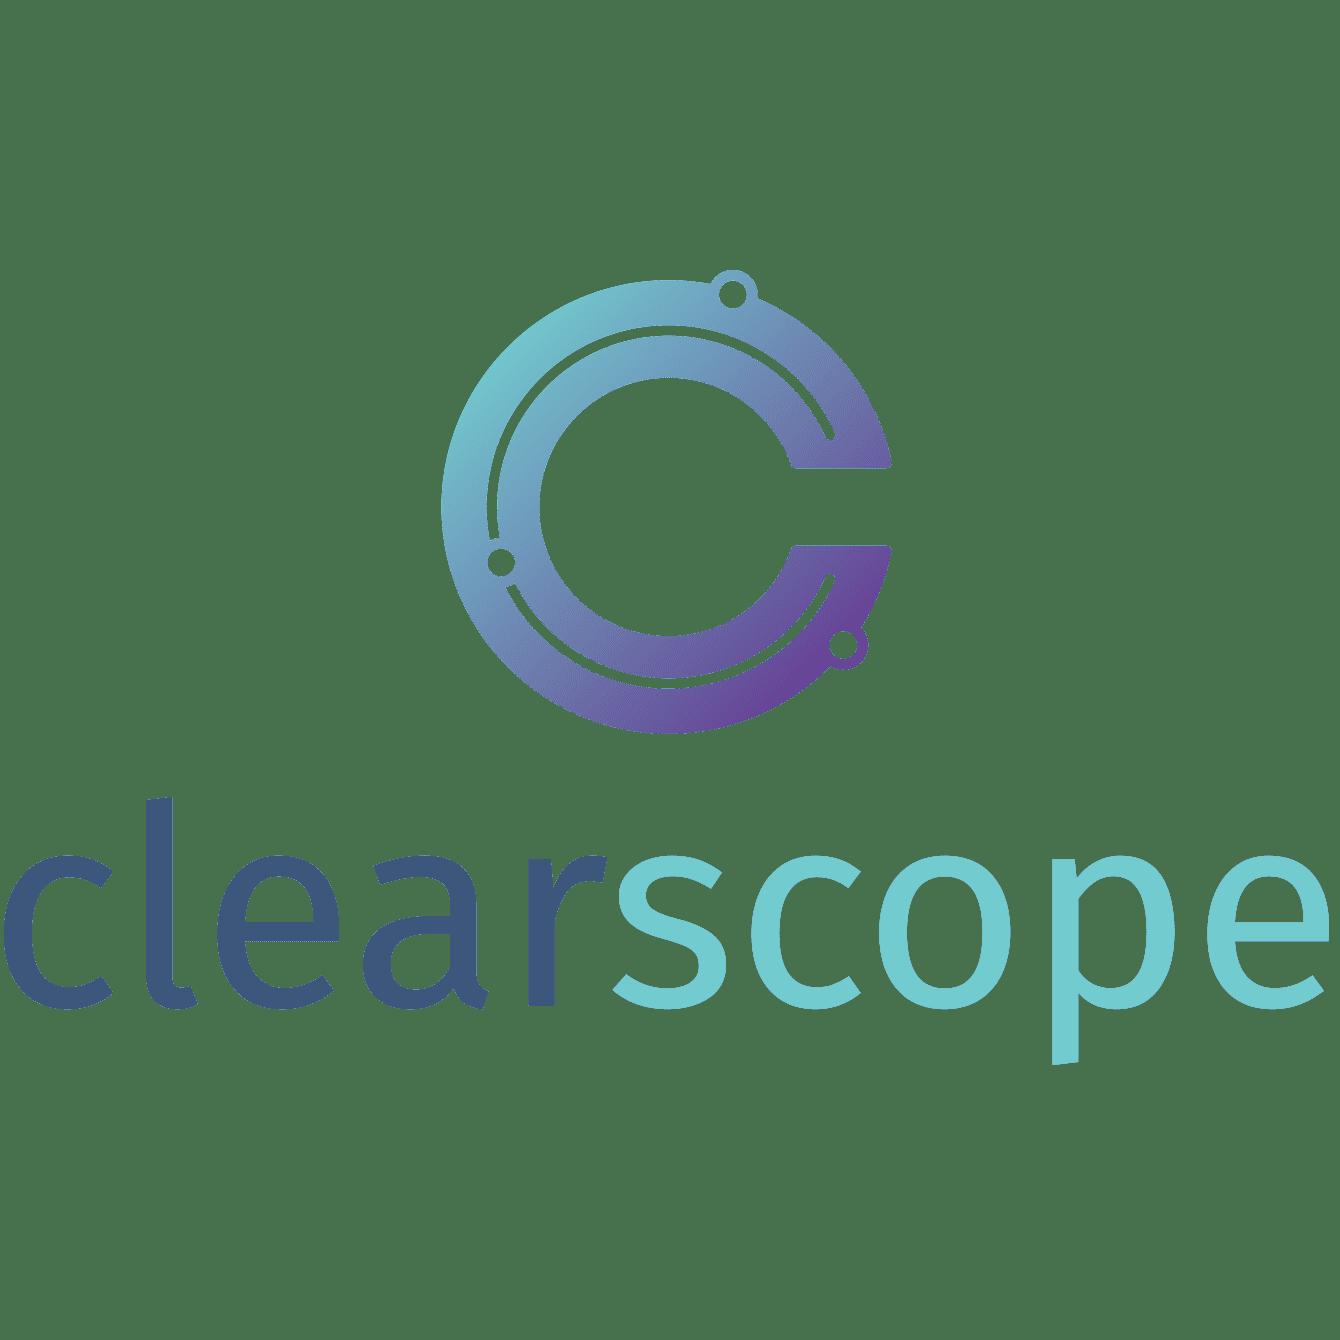 Clear Scope logo design by DIF Design